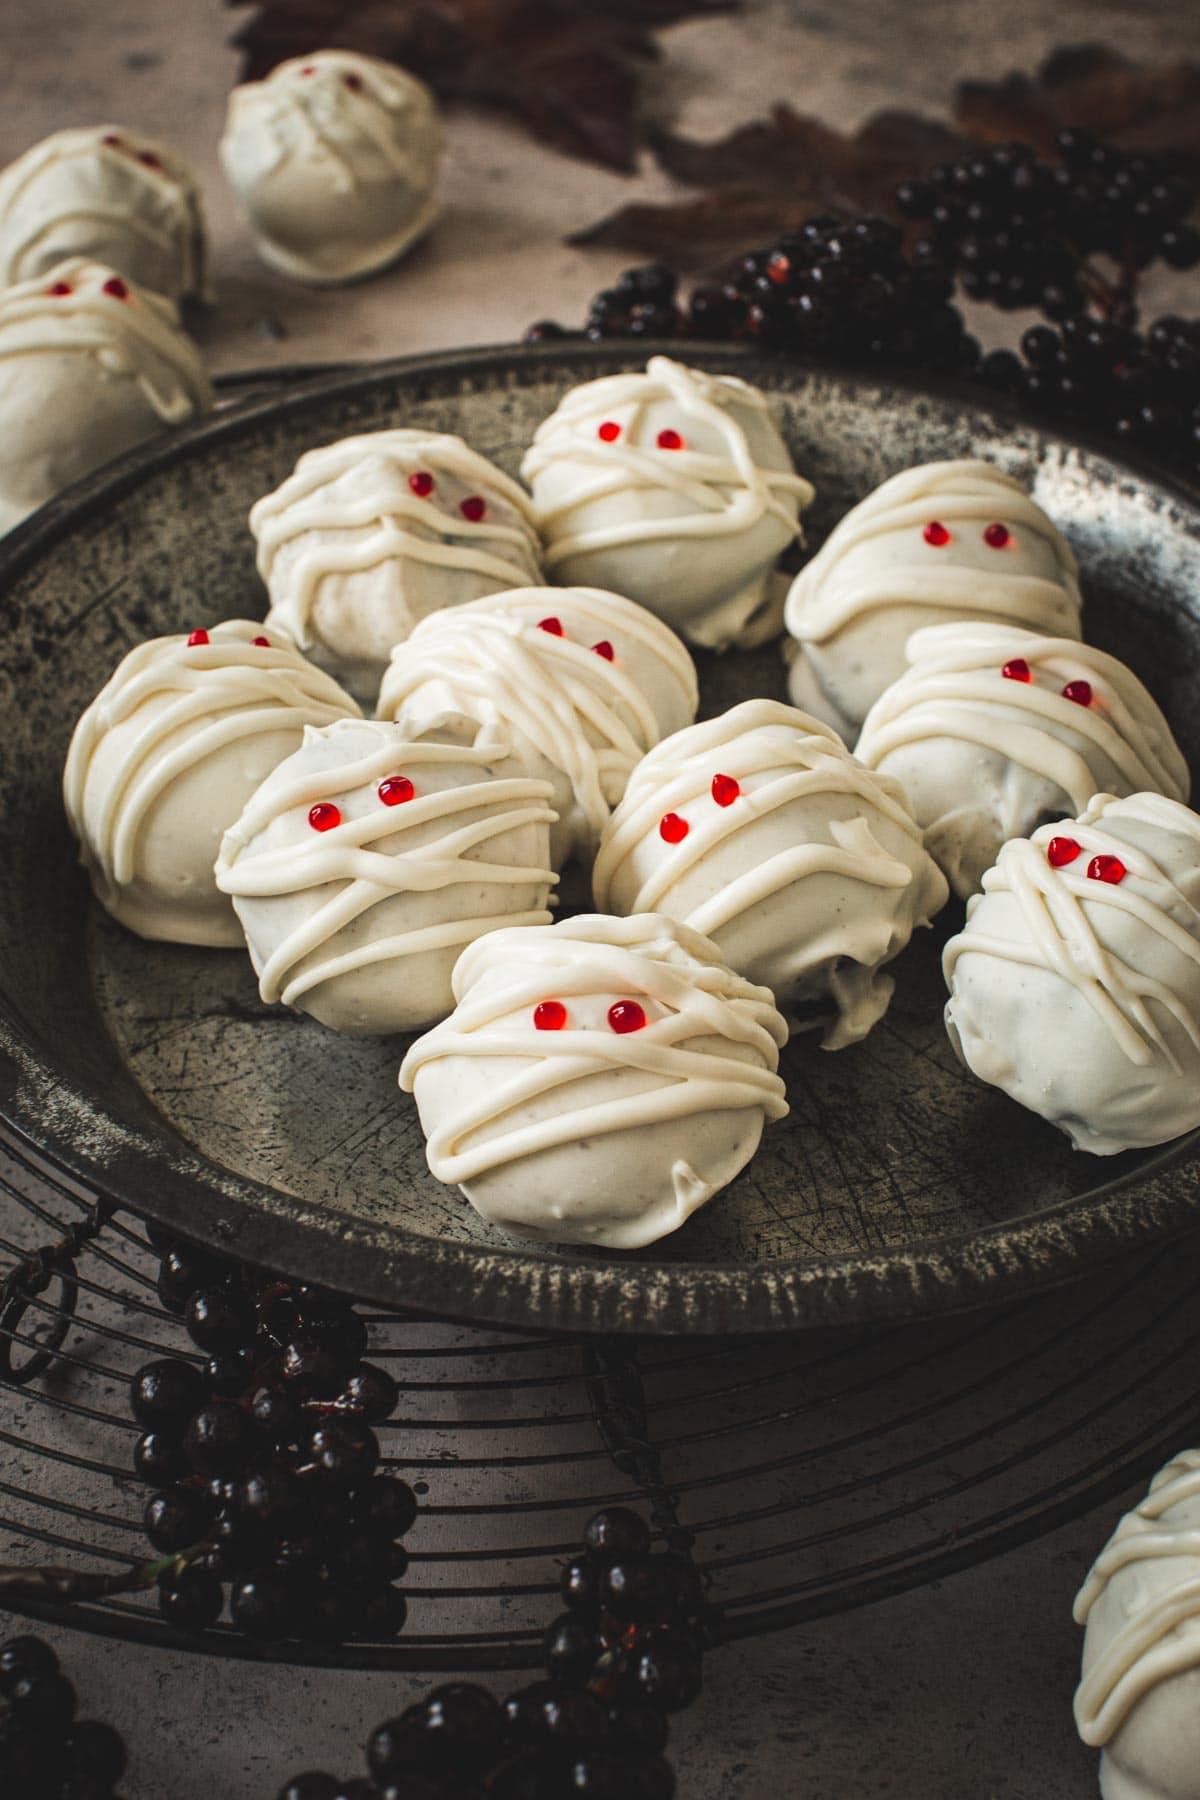 Mummy Oreo cookie balls in a metal pie tin.